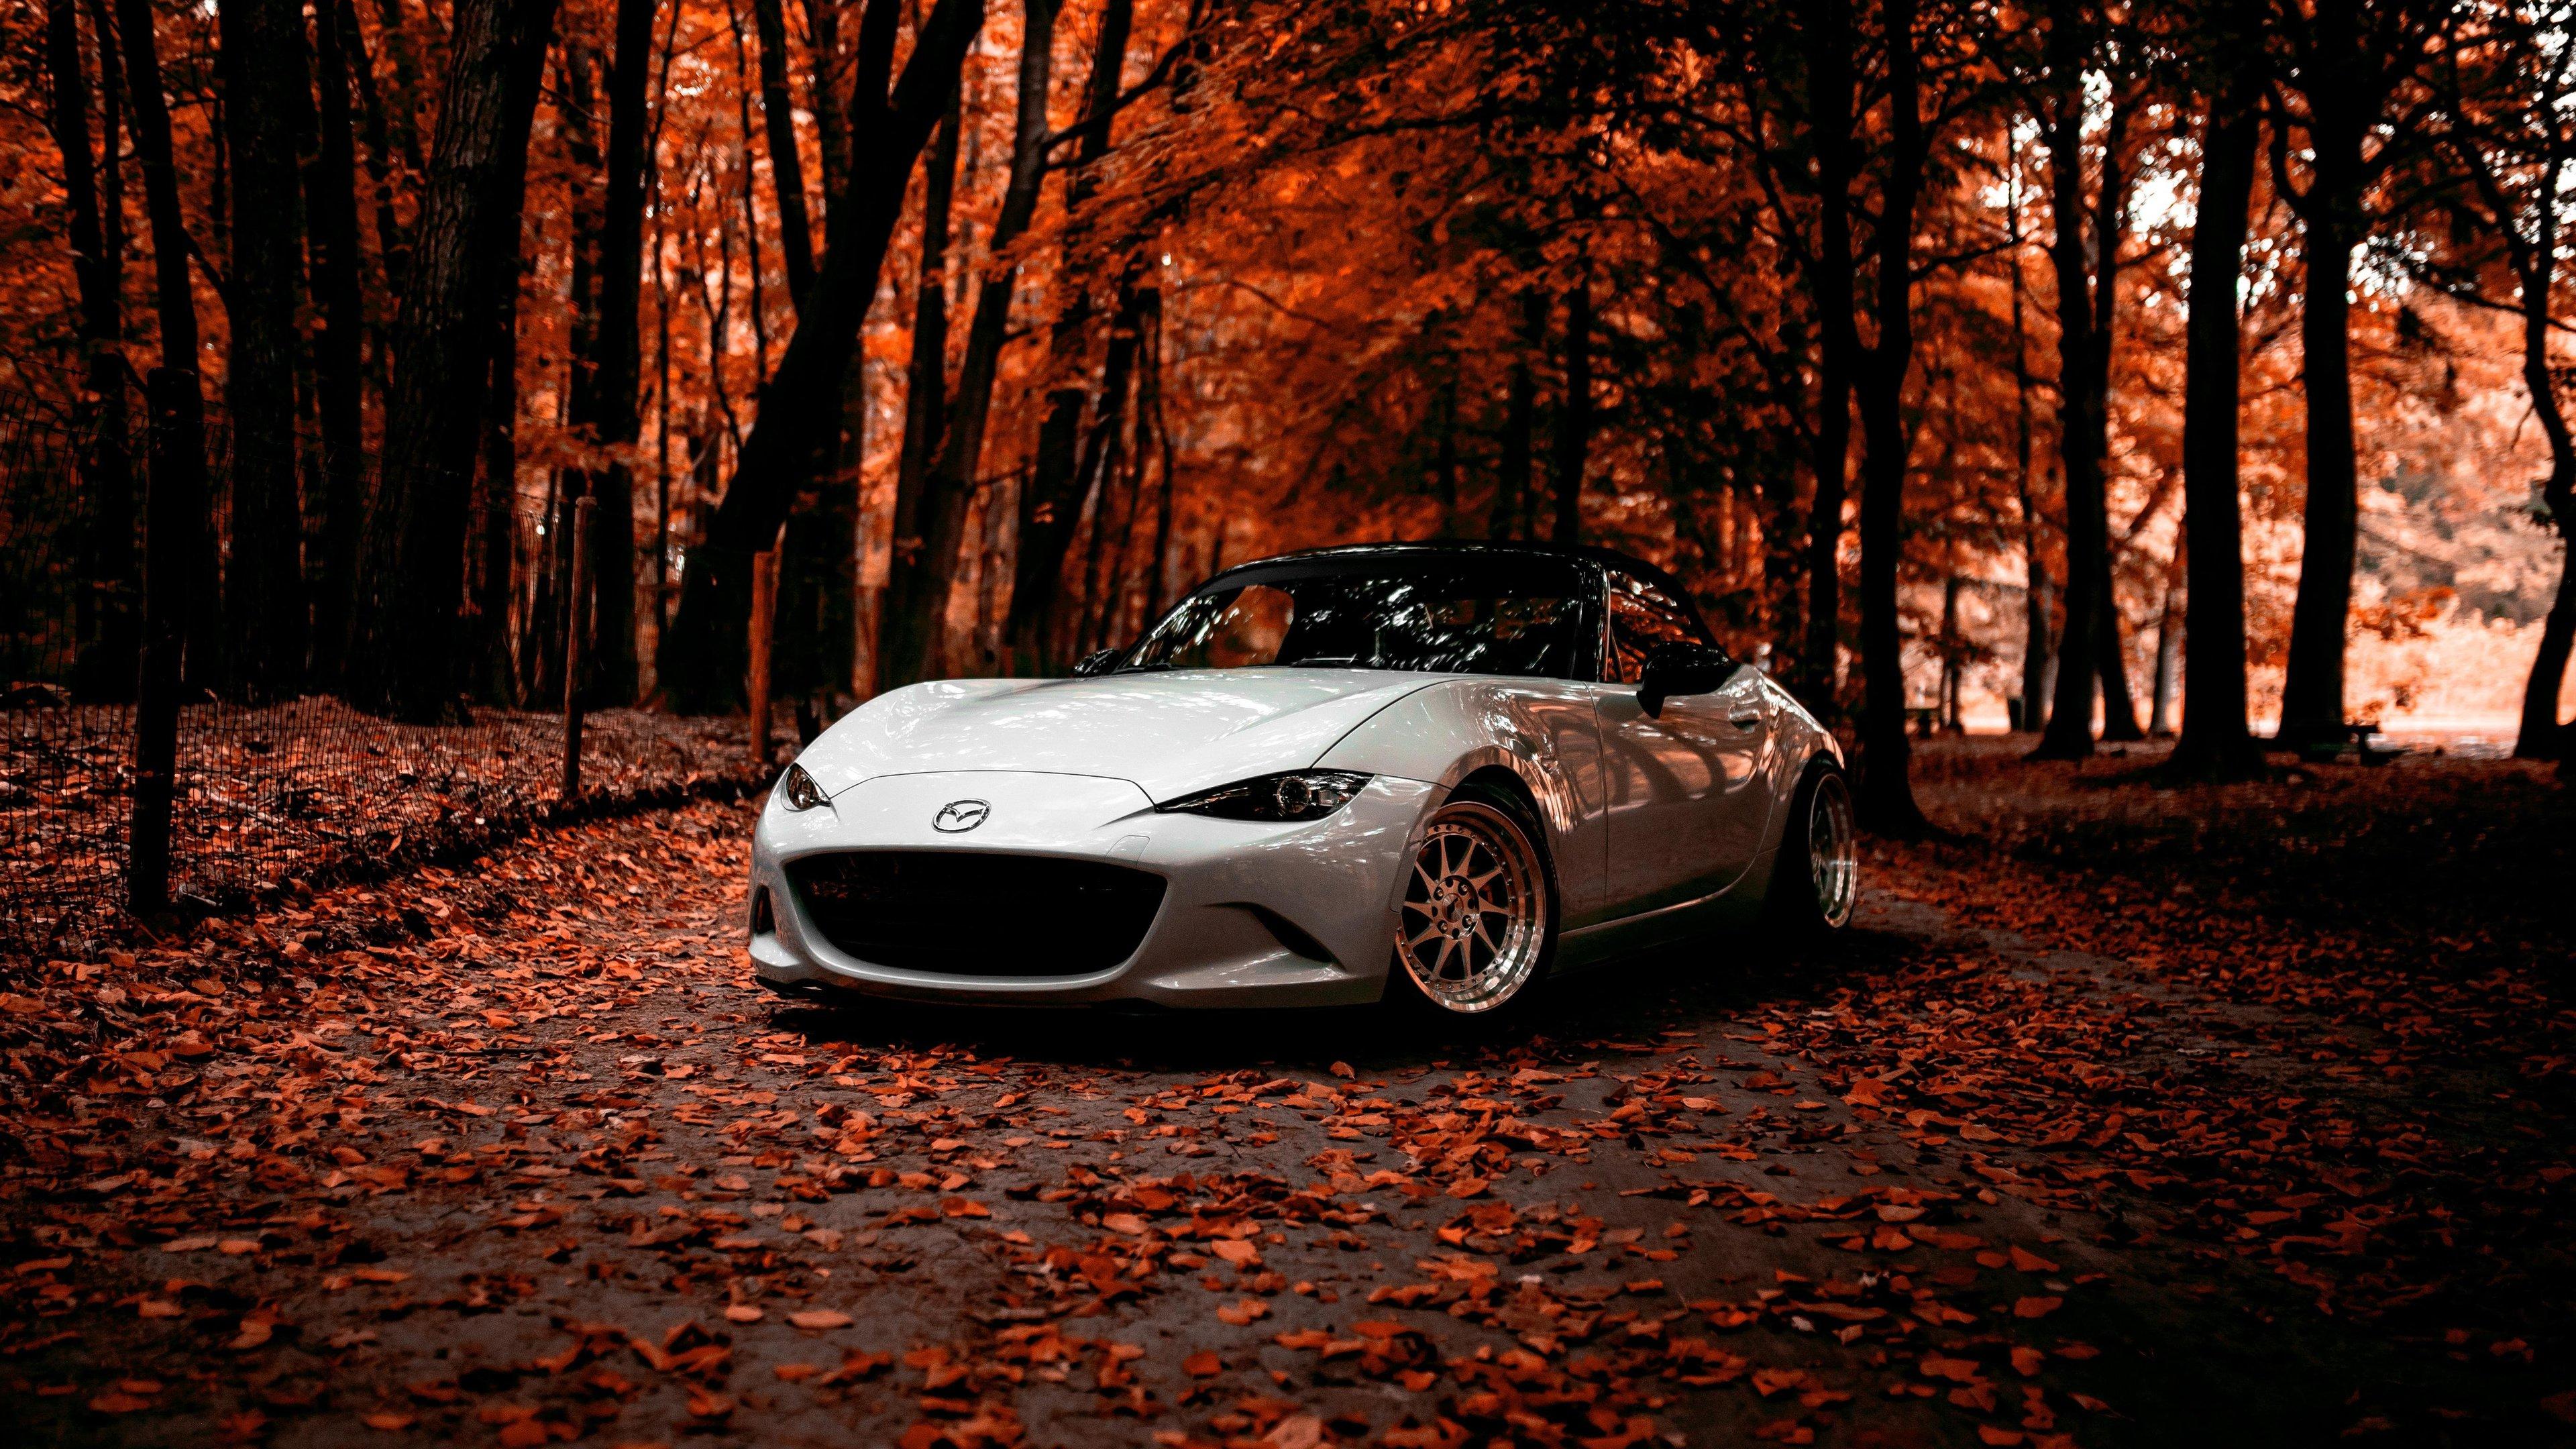 mazda 4k 1547936799 - Mazda 4k - mazda wallpapers, hd-wallpapers, cars wallpapers, 5k wallpapers, 4k-wallpapers